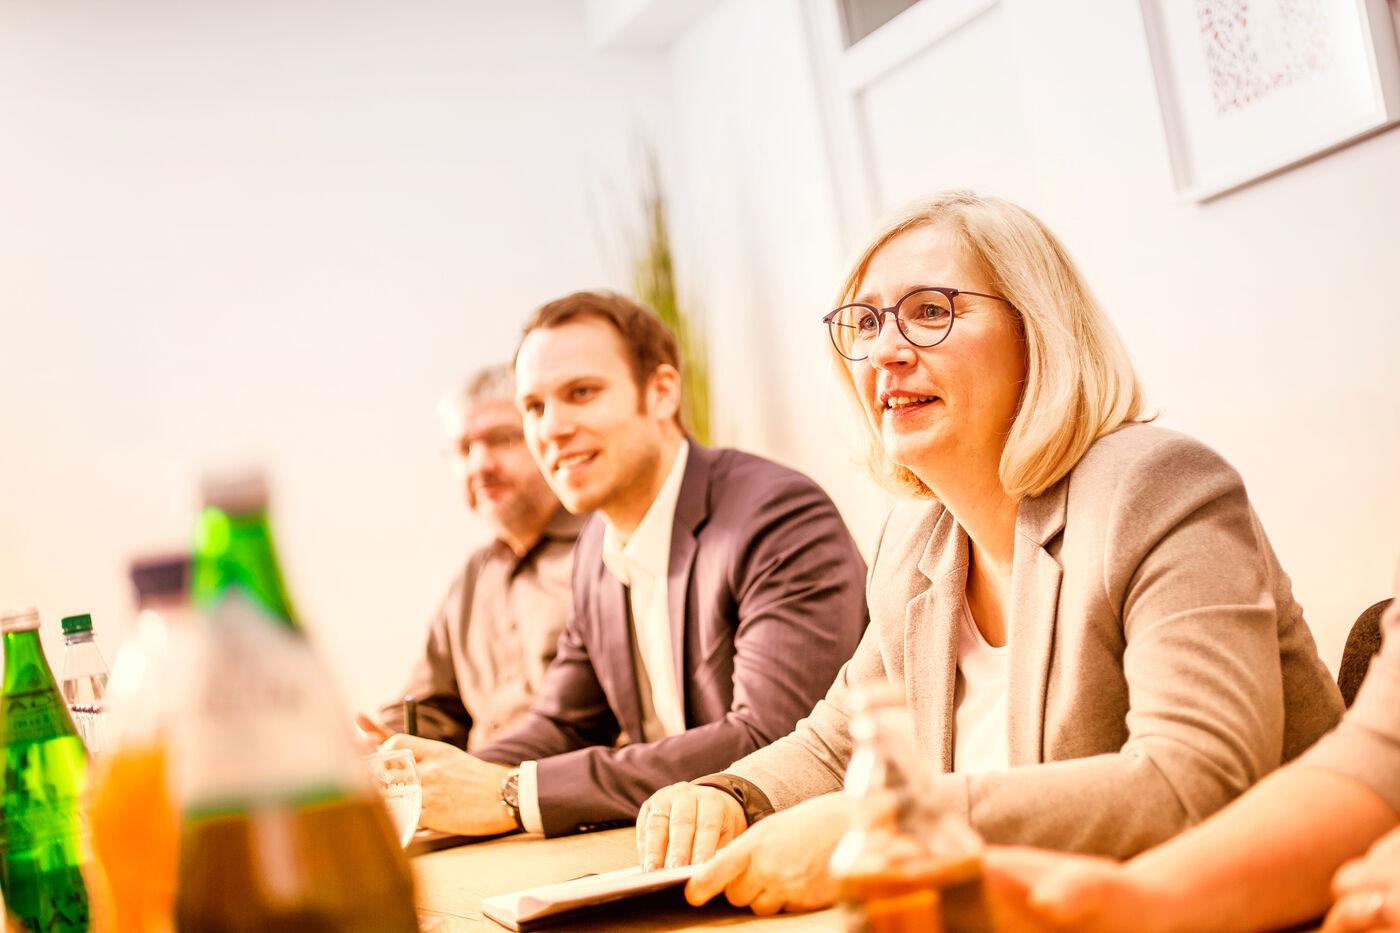 Leiter Kundenservice (w/m/d) - Job Haselünne, Home office - Karriere bei Berentzen - Application form